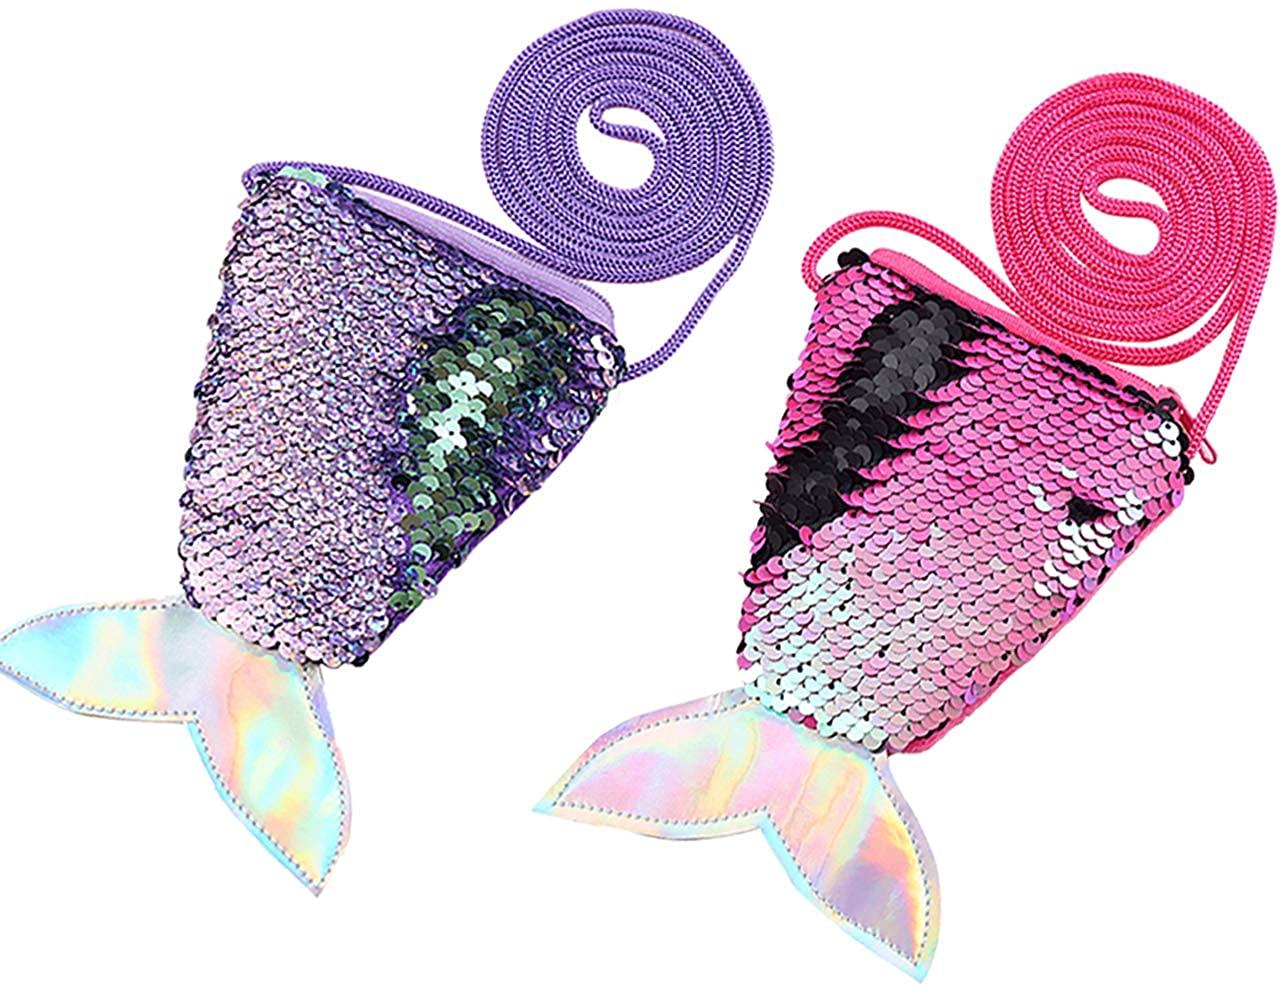 CHIC DIARY Small Mini Coin Purse Sequins Messenger Bag Crossbody Satchel